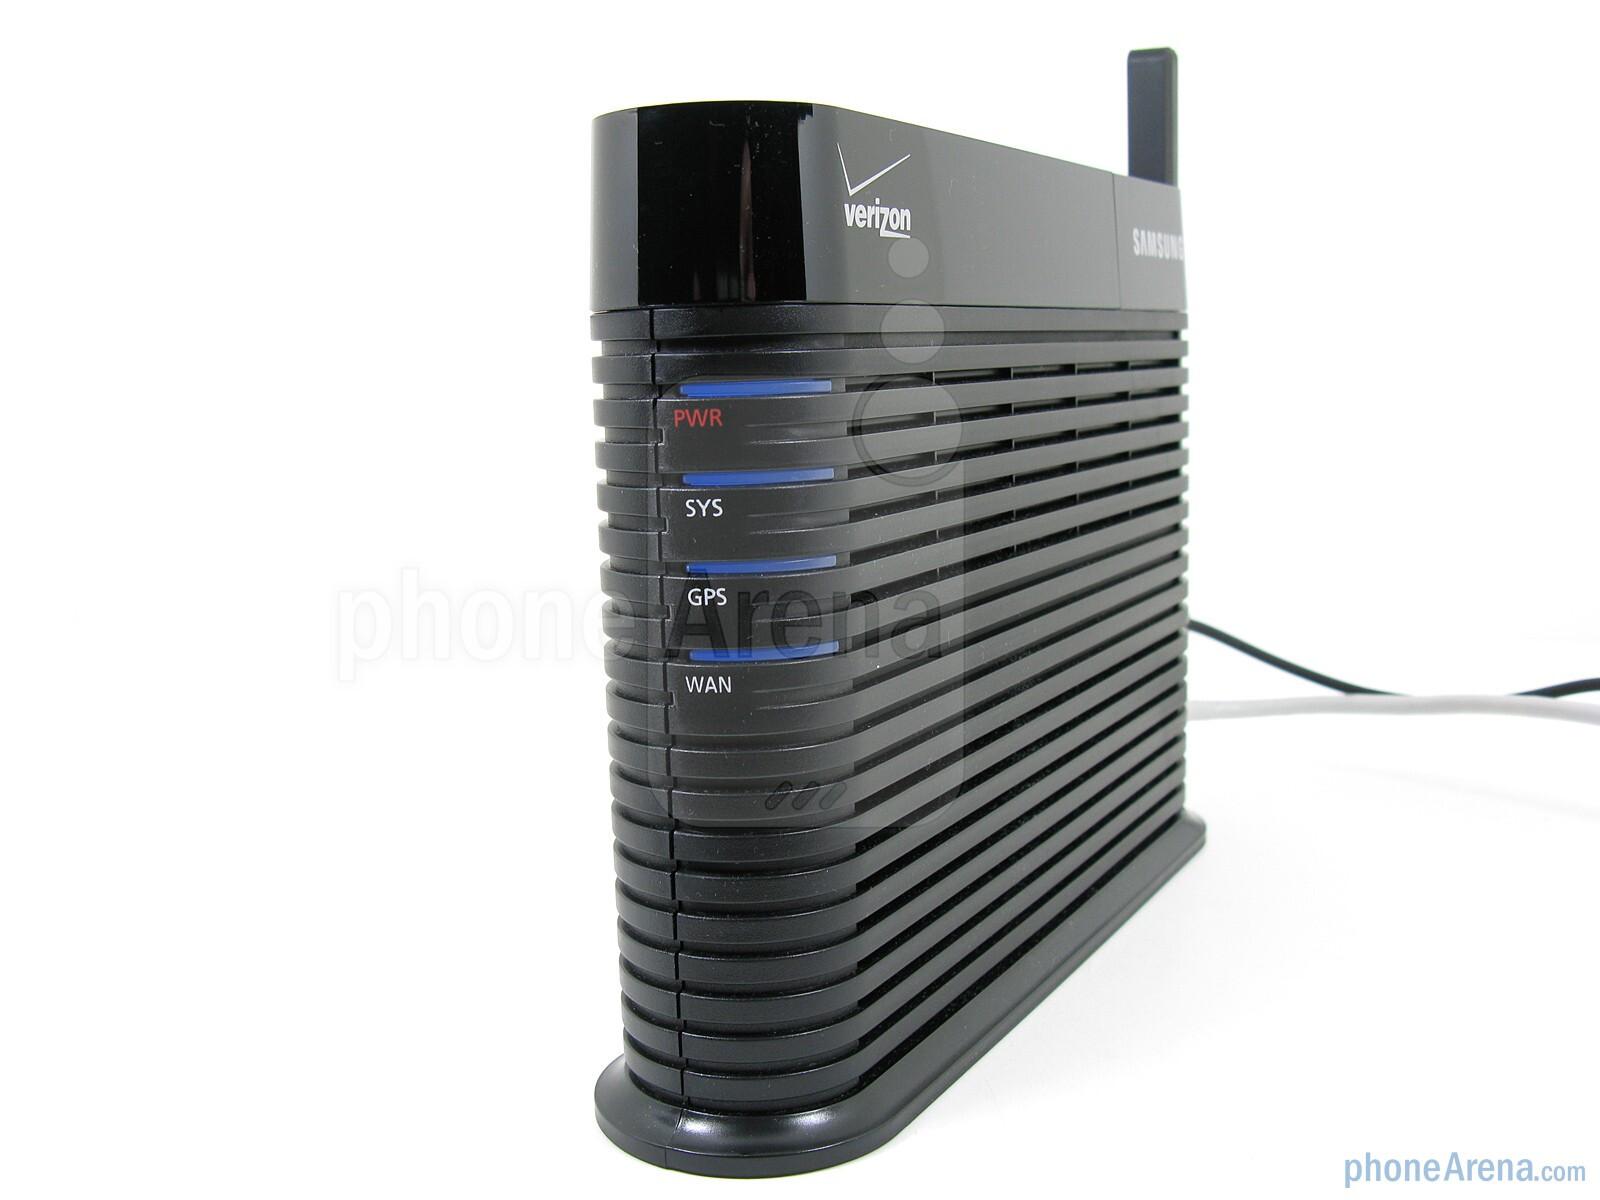 Verizon Network Extender Base Station - Samsung US